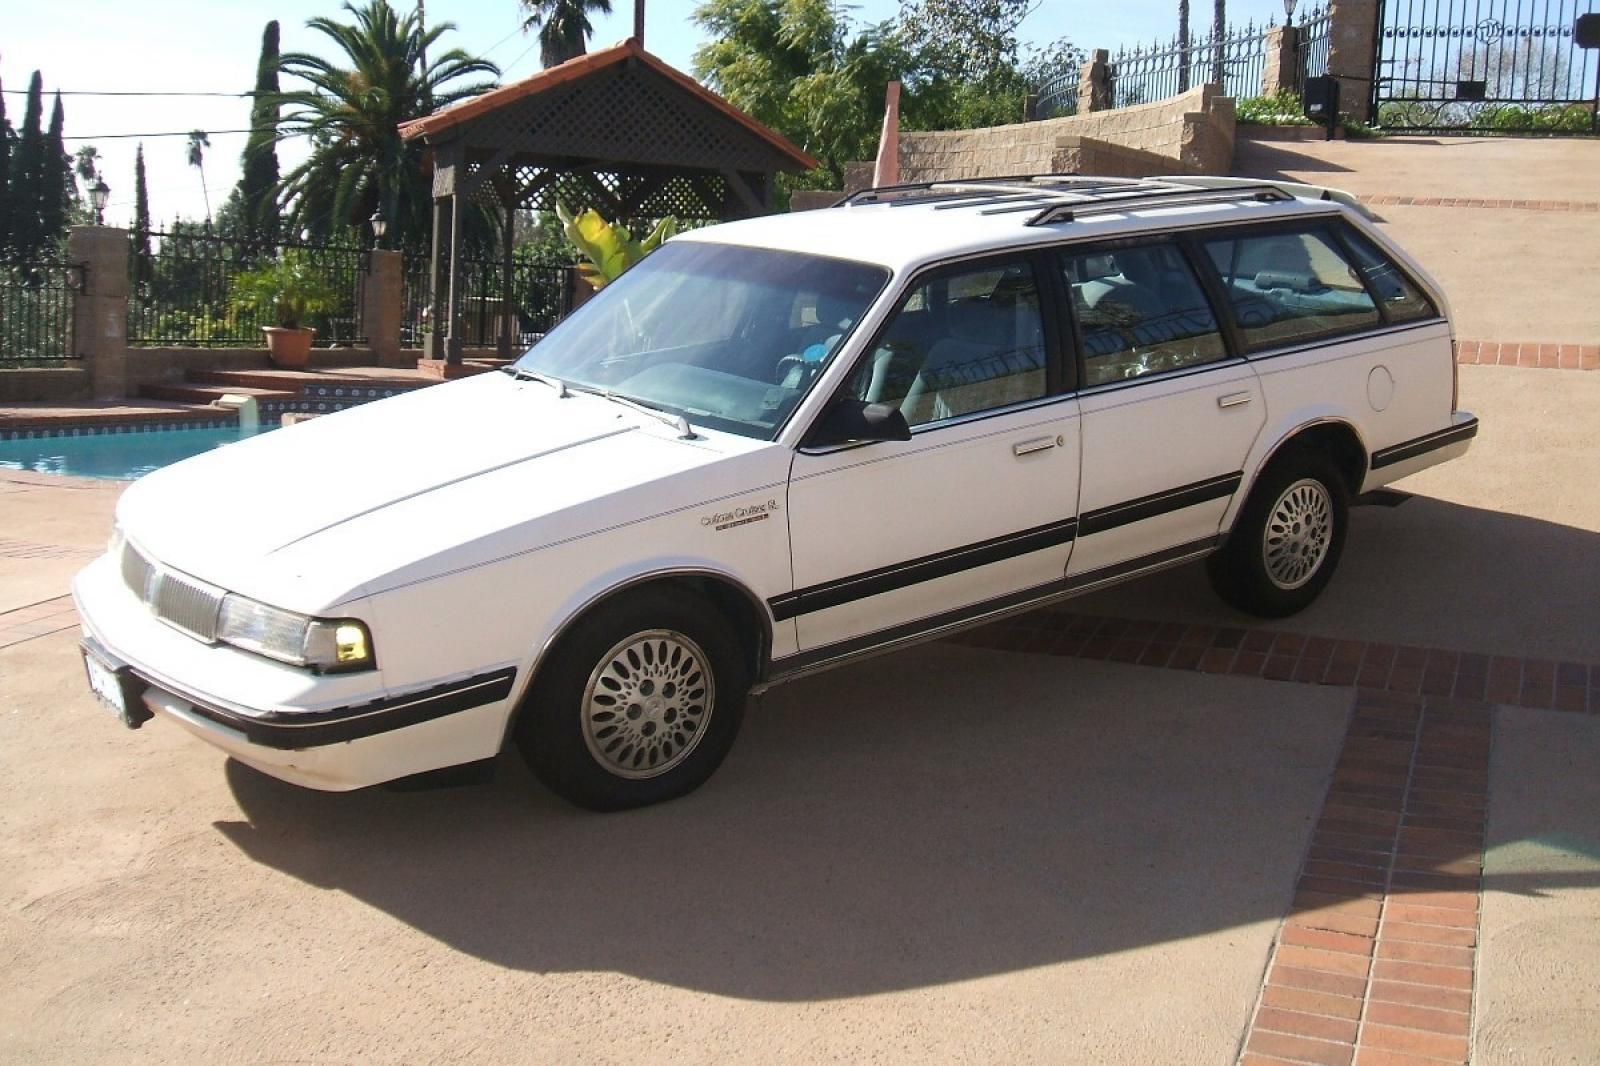 800 1024 1280 1600 Origin 1992 Oldsmobile Cutlass Ciera